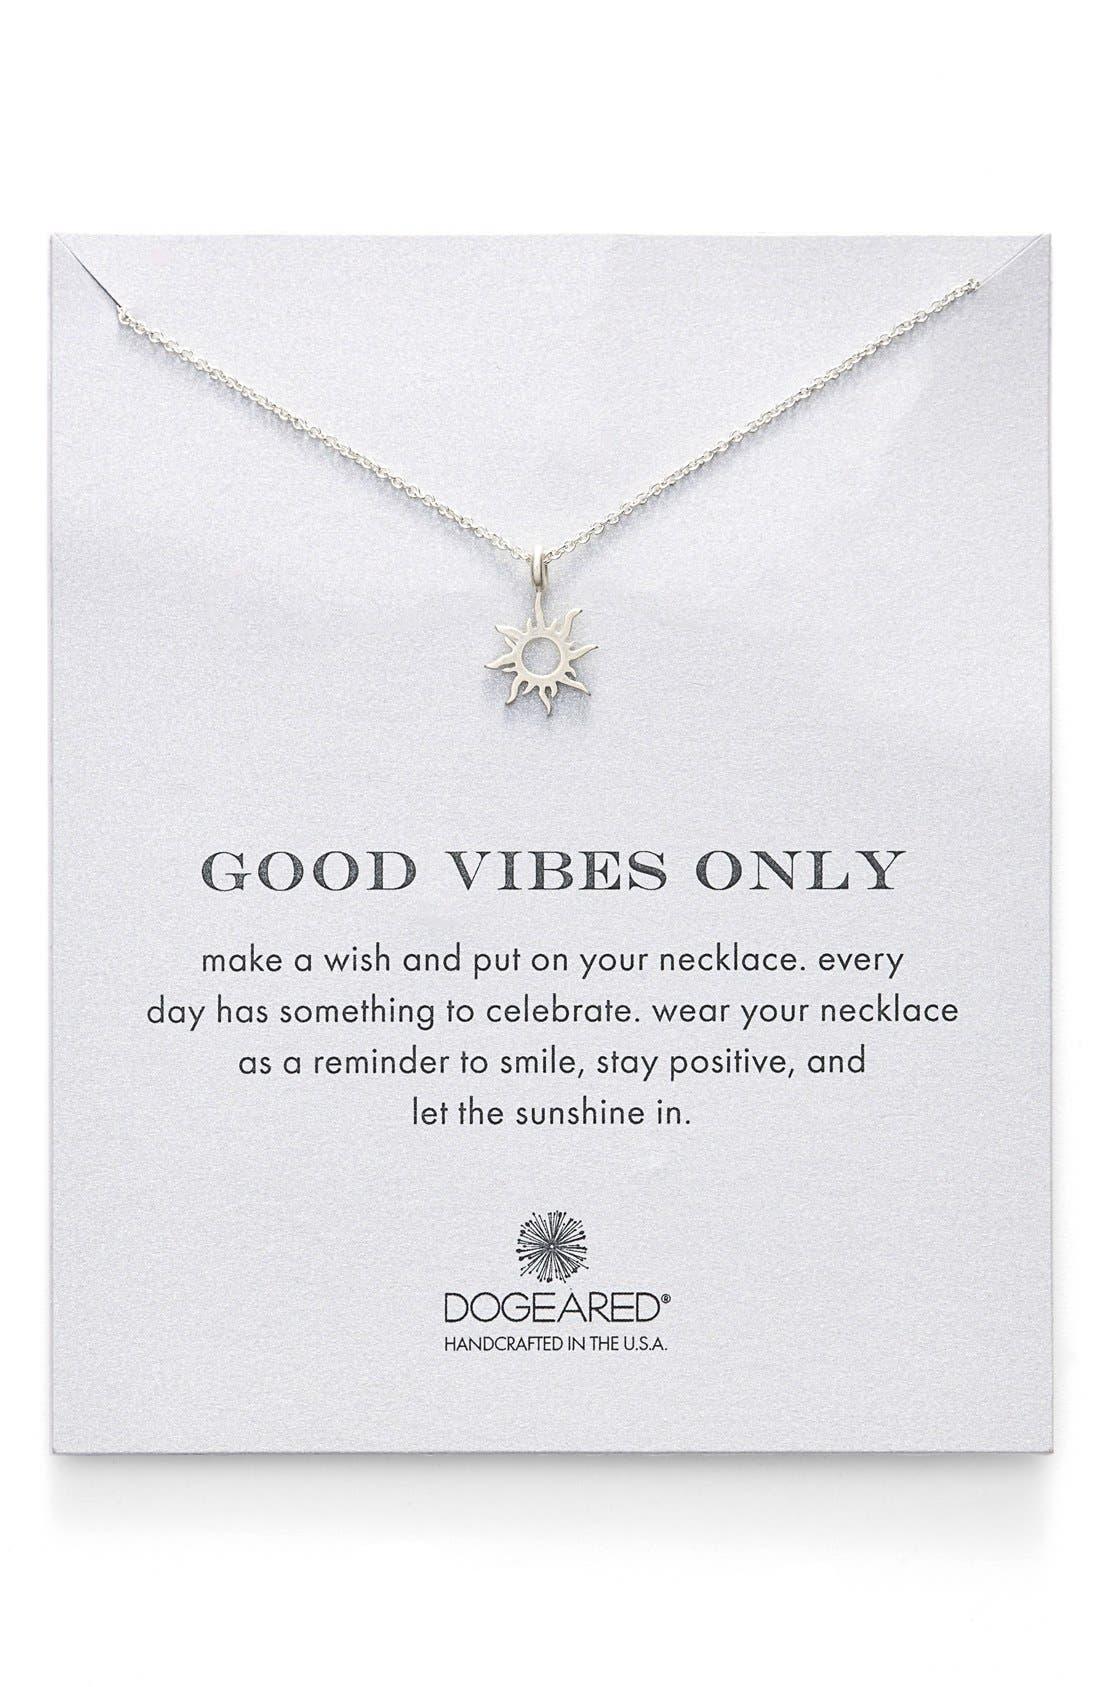 Alternate Image 1 Selected - Dogeared 'Good Vibes Only' Sunburst Pendant Necklace